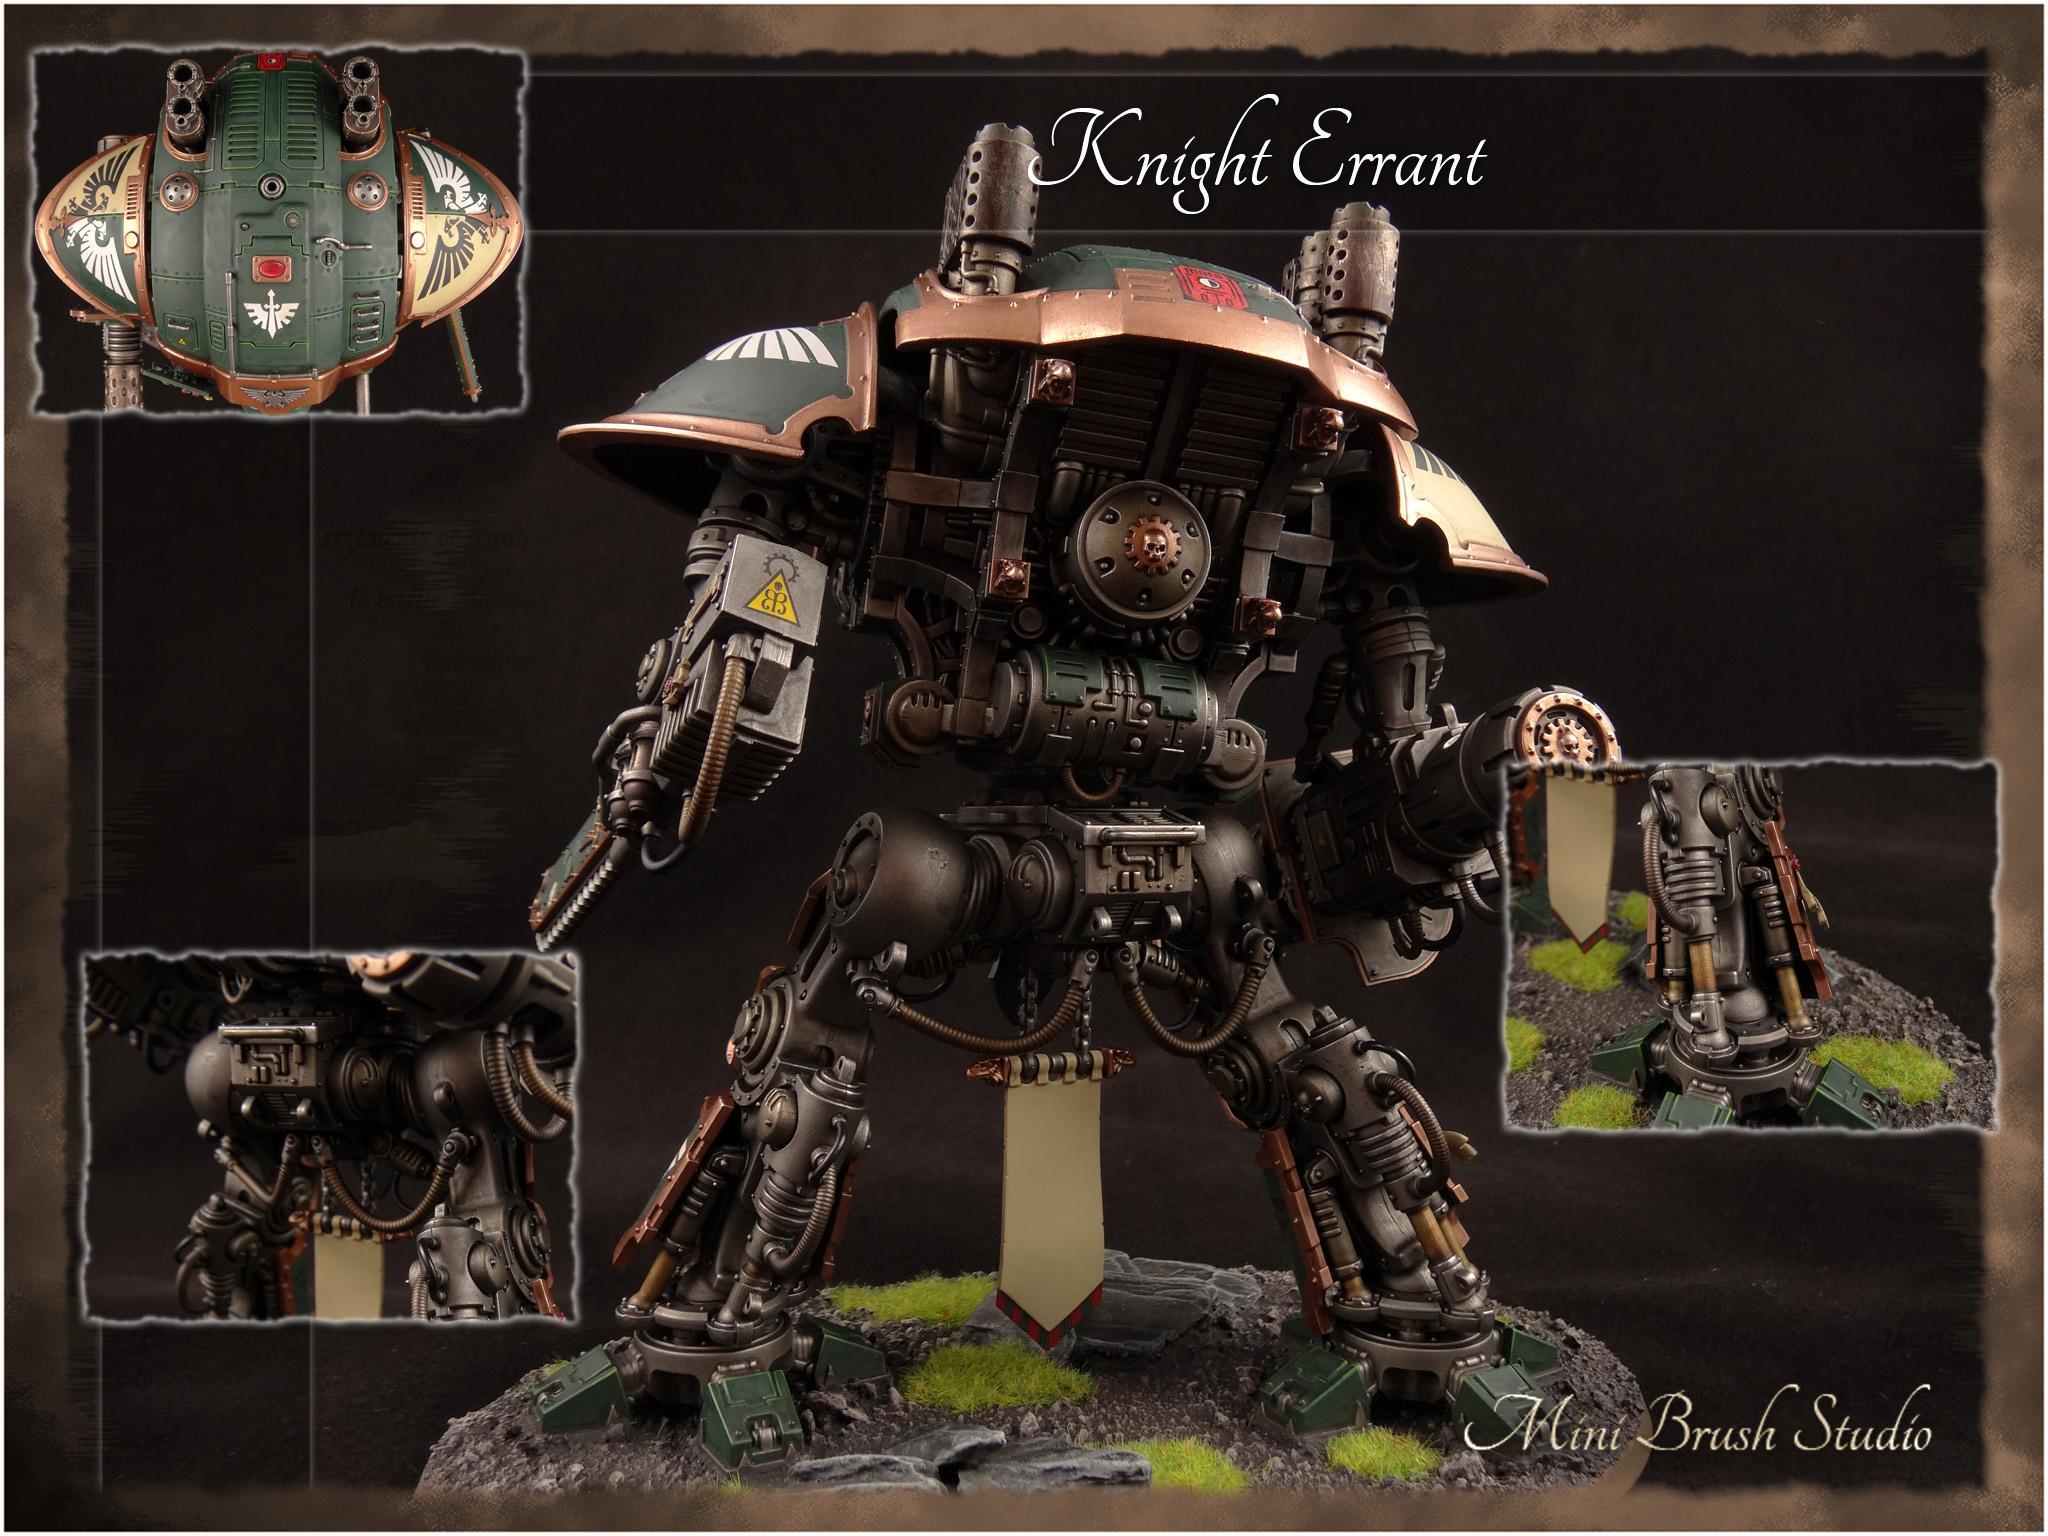 Imperial Knights, Knight Errant, Warhammer 40,000